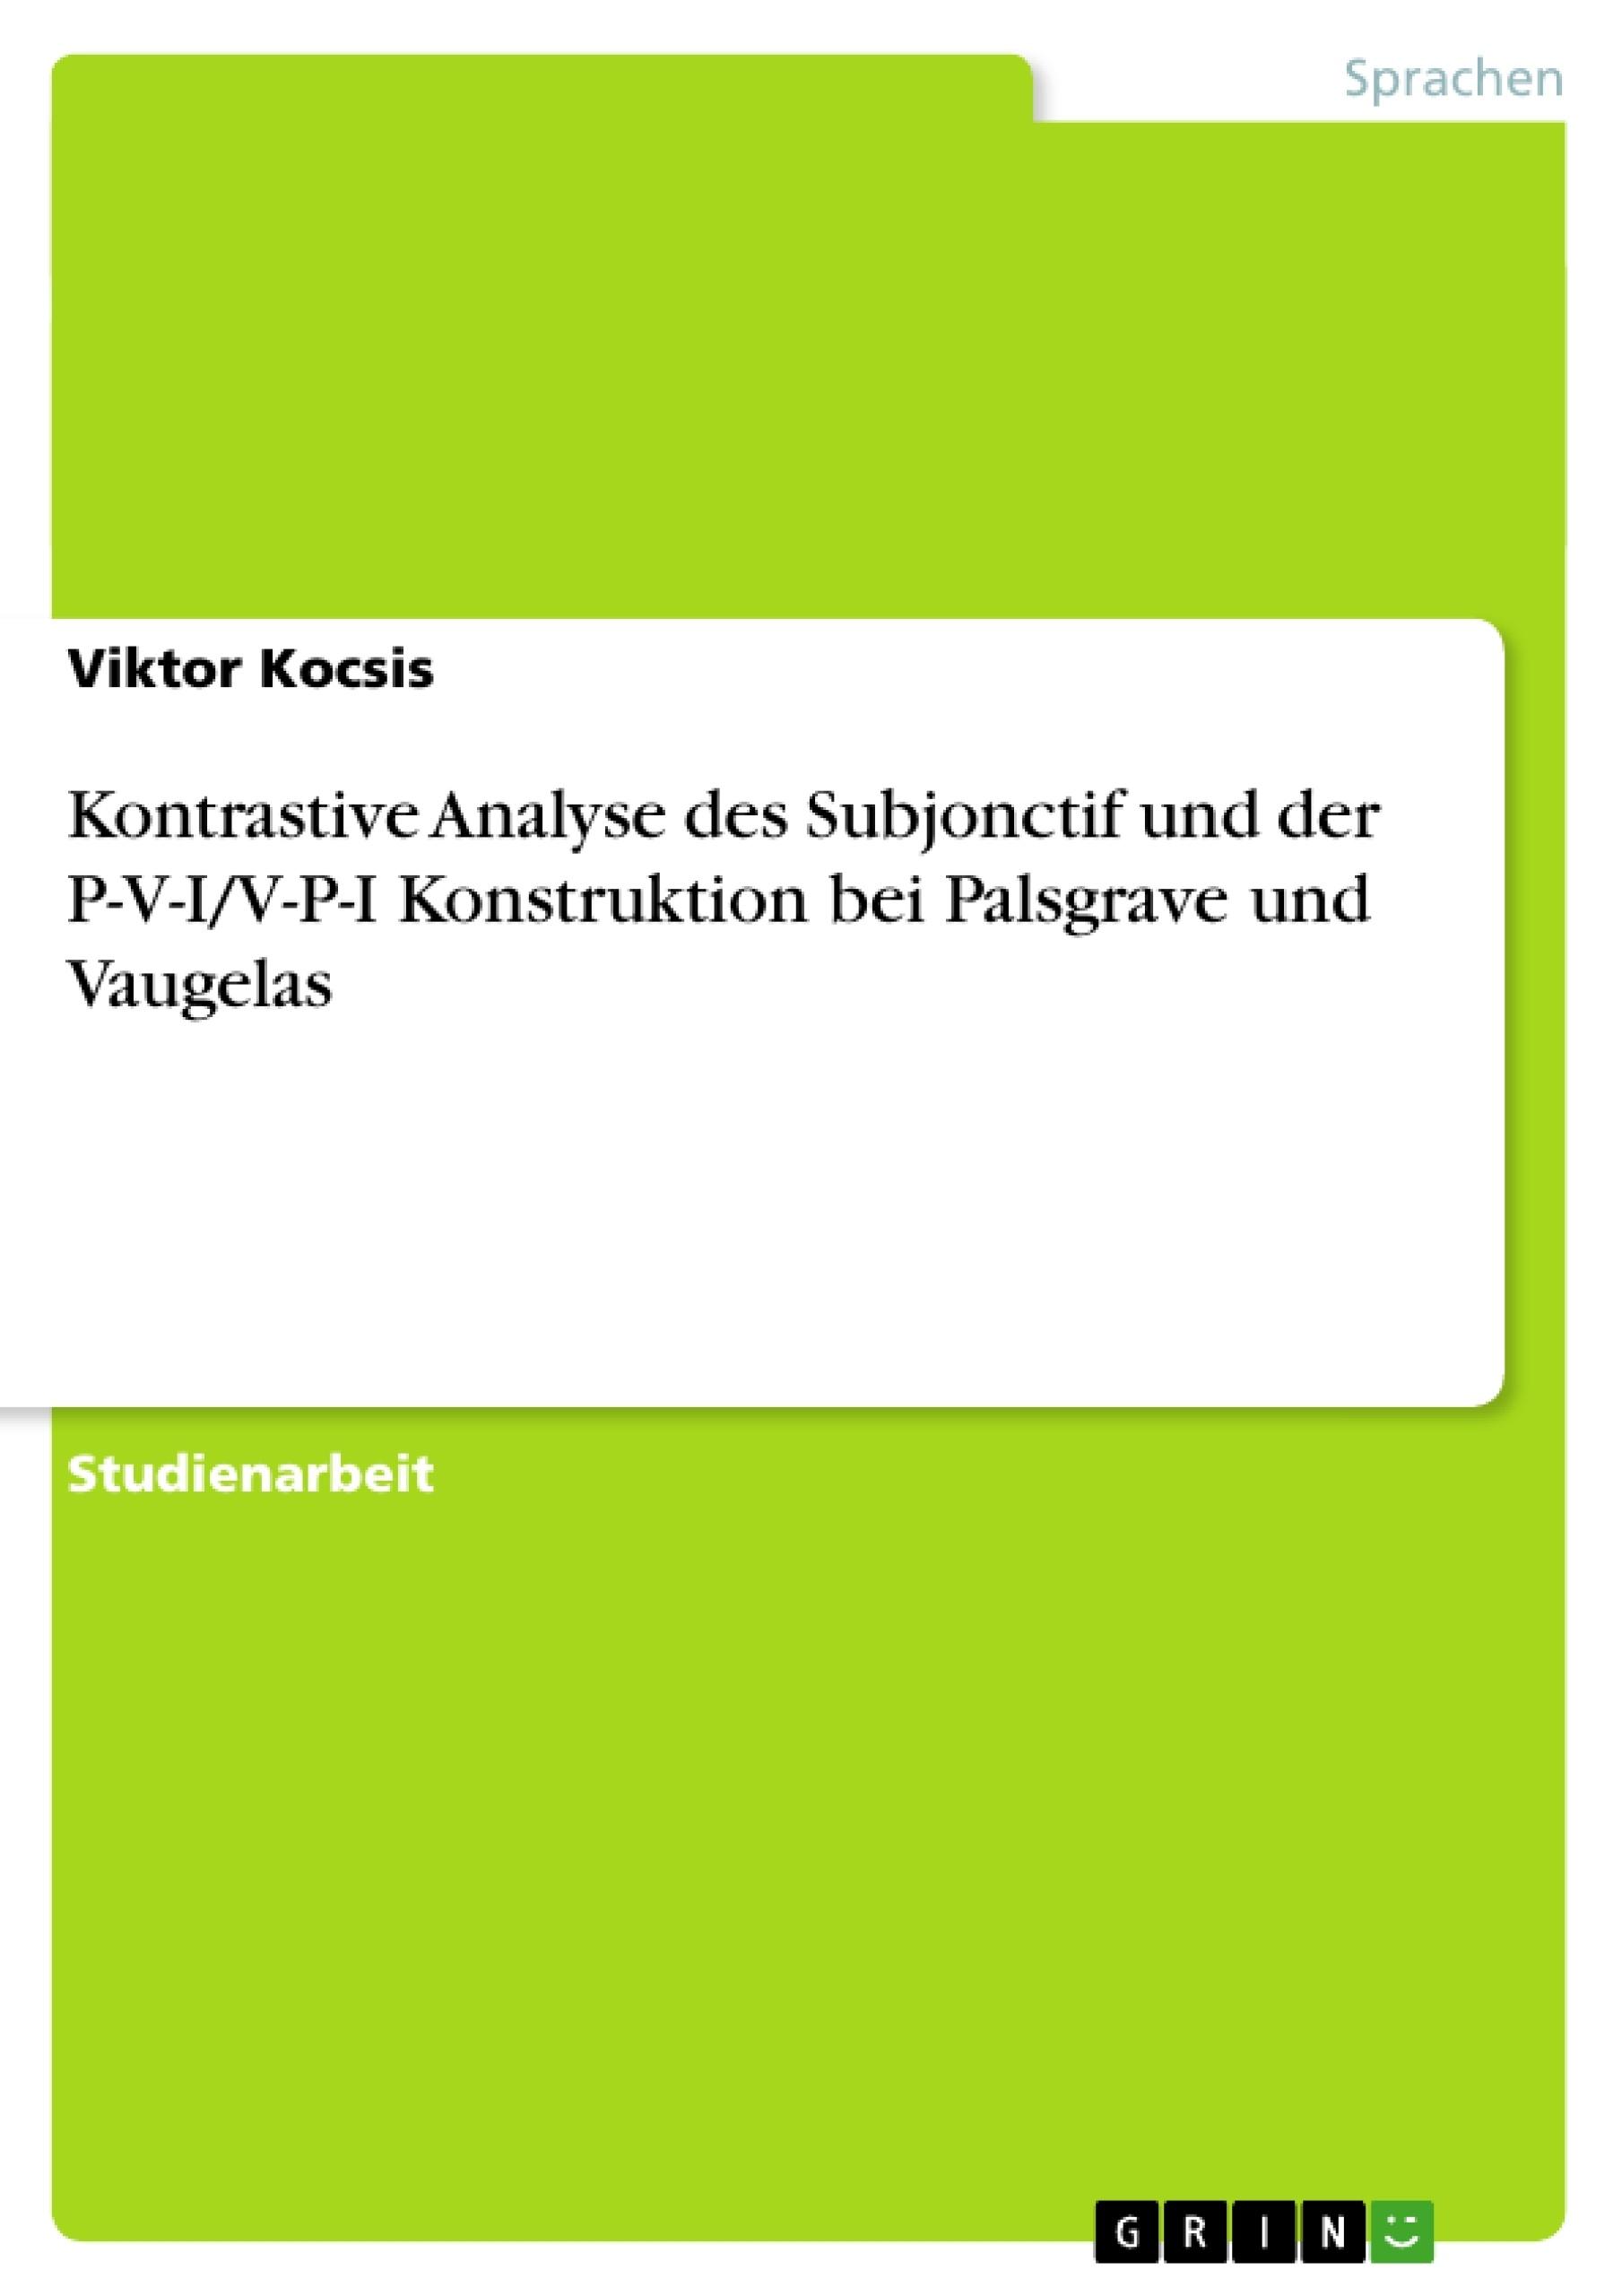 Titel: Kontrastive Analyse des Subjonctif und der P-V-I/V-P-I Konstruktion bei Palsgrave und Vaugelas